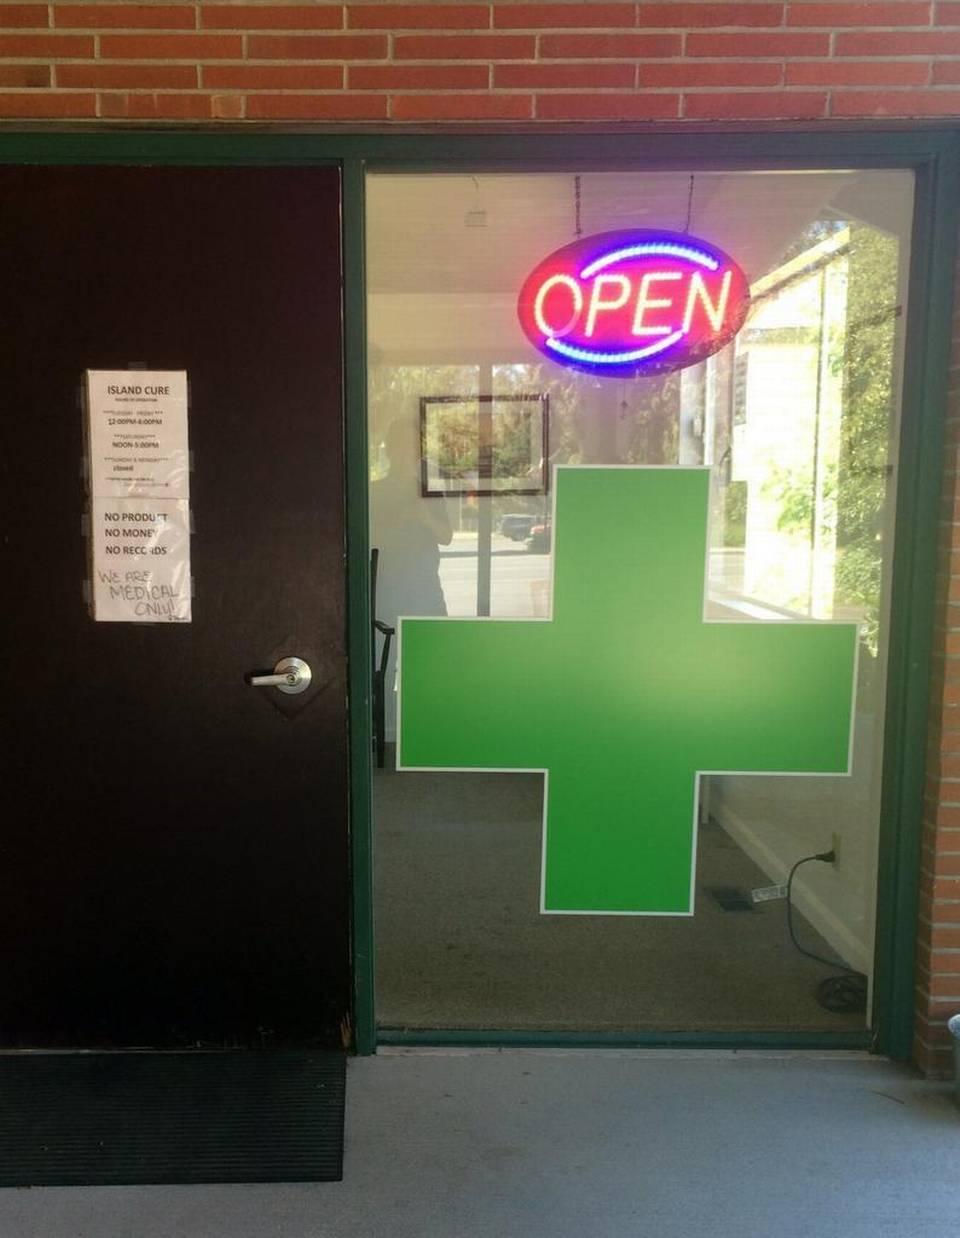 Vashon pot dispensary continues to sell after July 1 cutoff